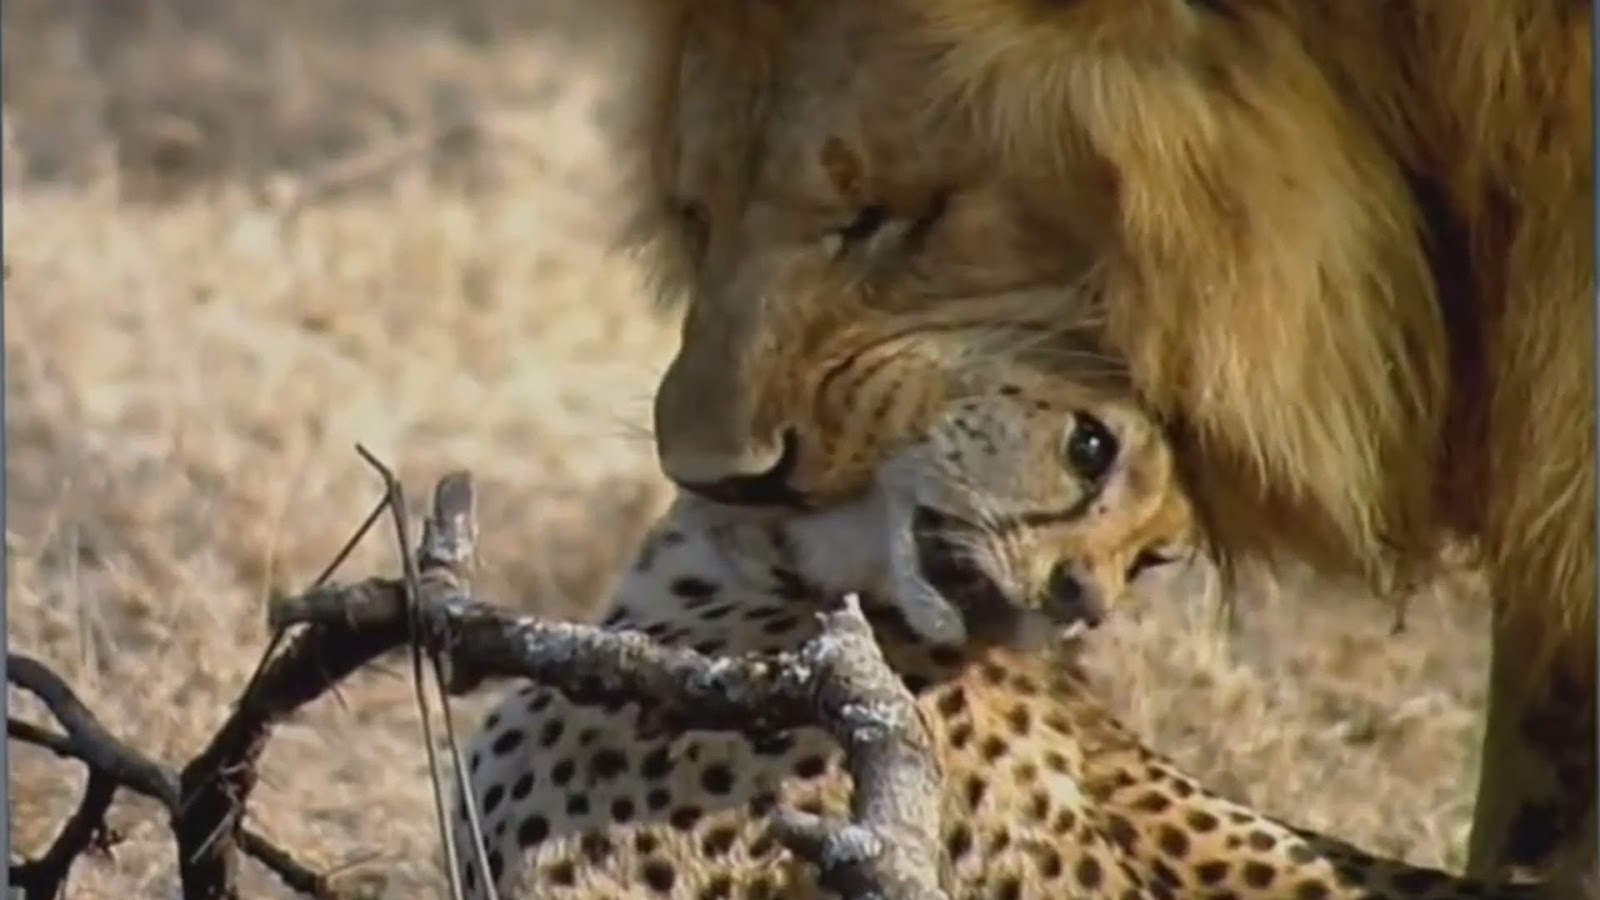 Do Big Cats Eat Other Cats Lepord Kills Cheetah